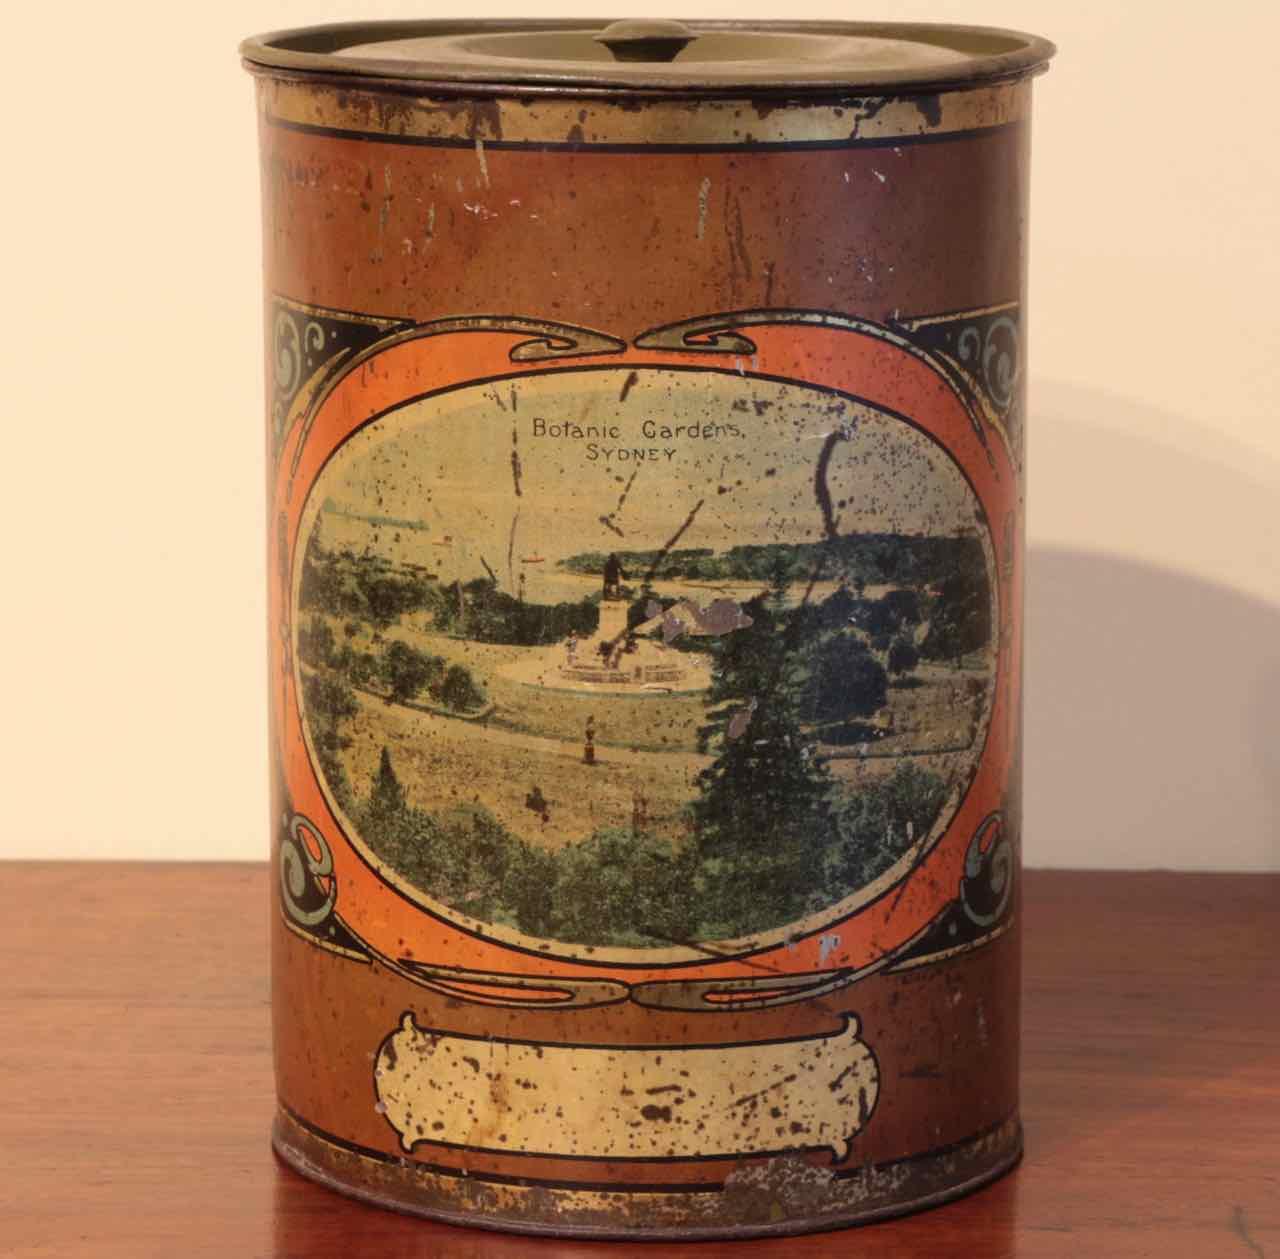 dillards kitchen canisters - 28 images - 100 dillards kitchen ...